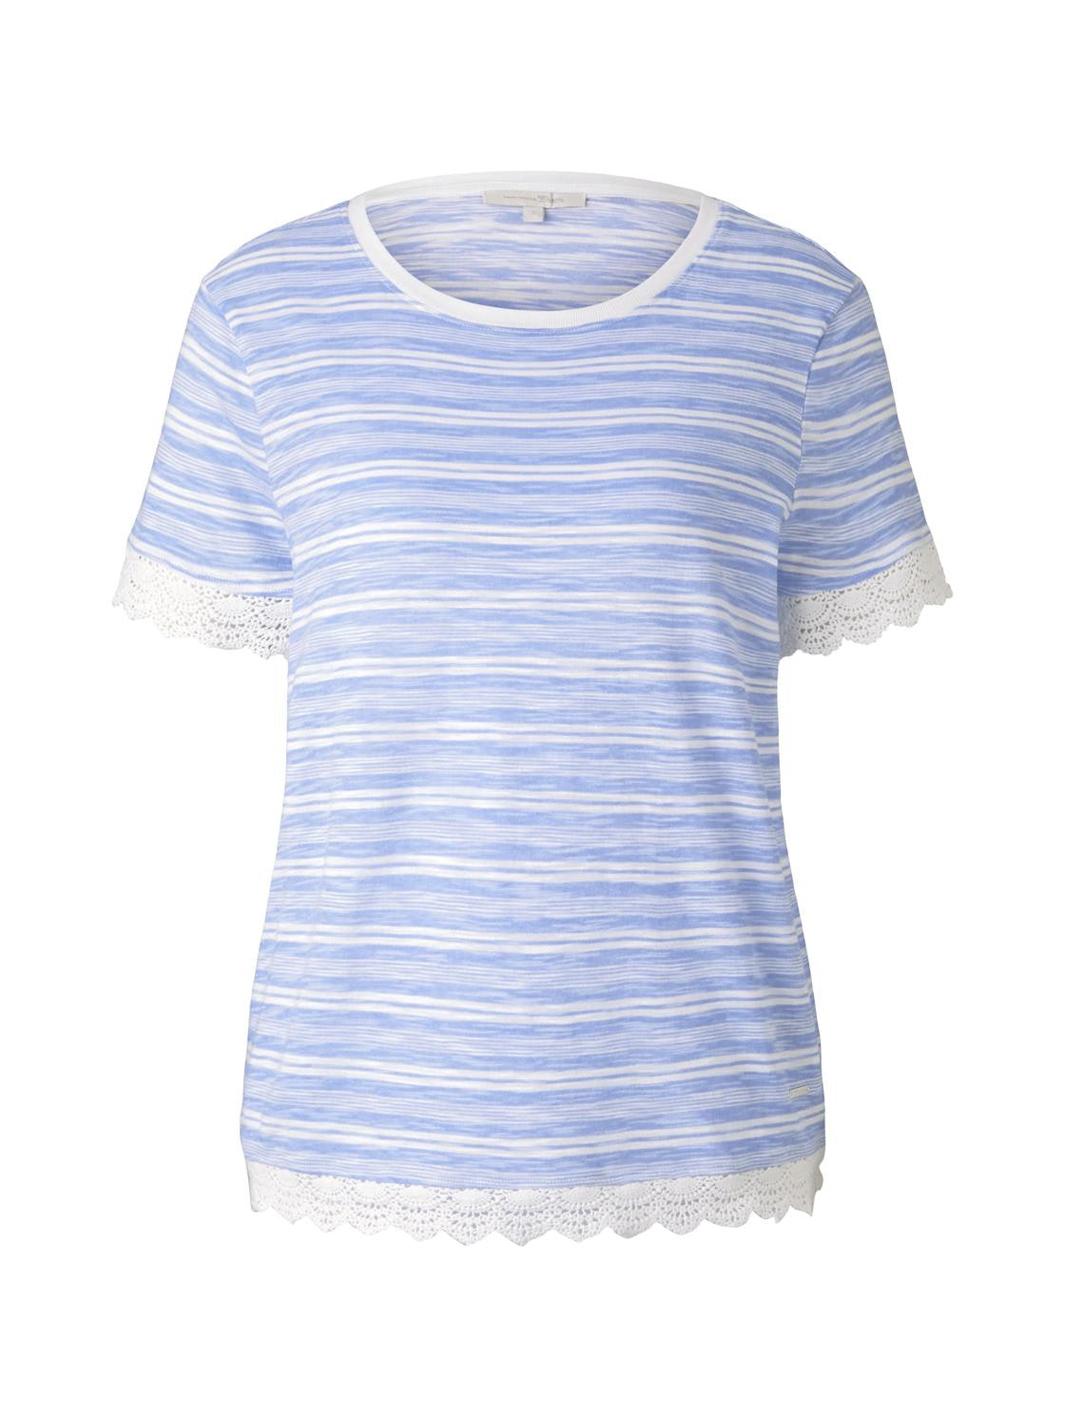 Tom Tailor Shirt mit Häkeldetails blau